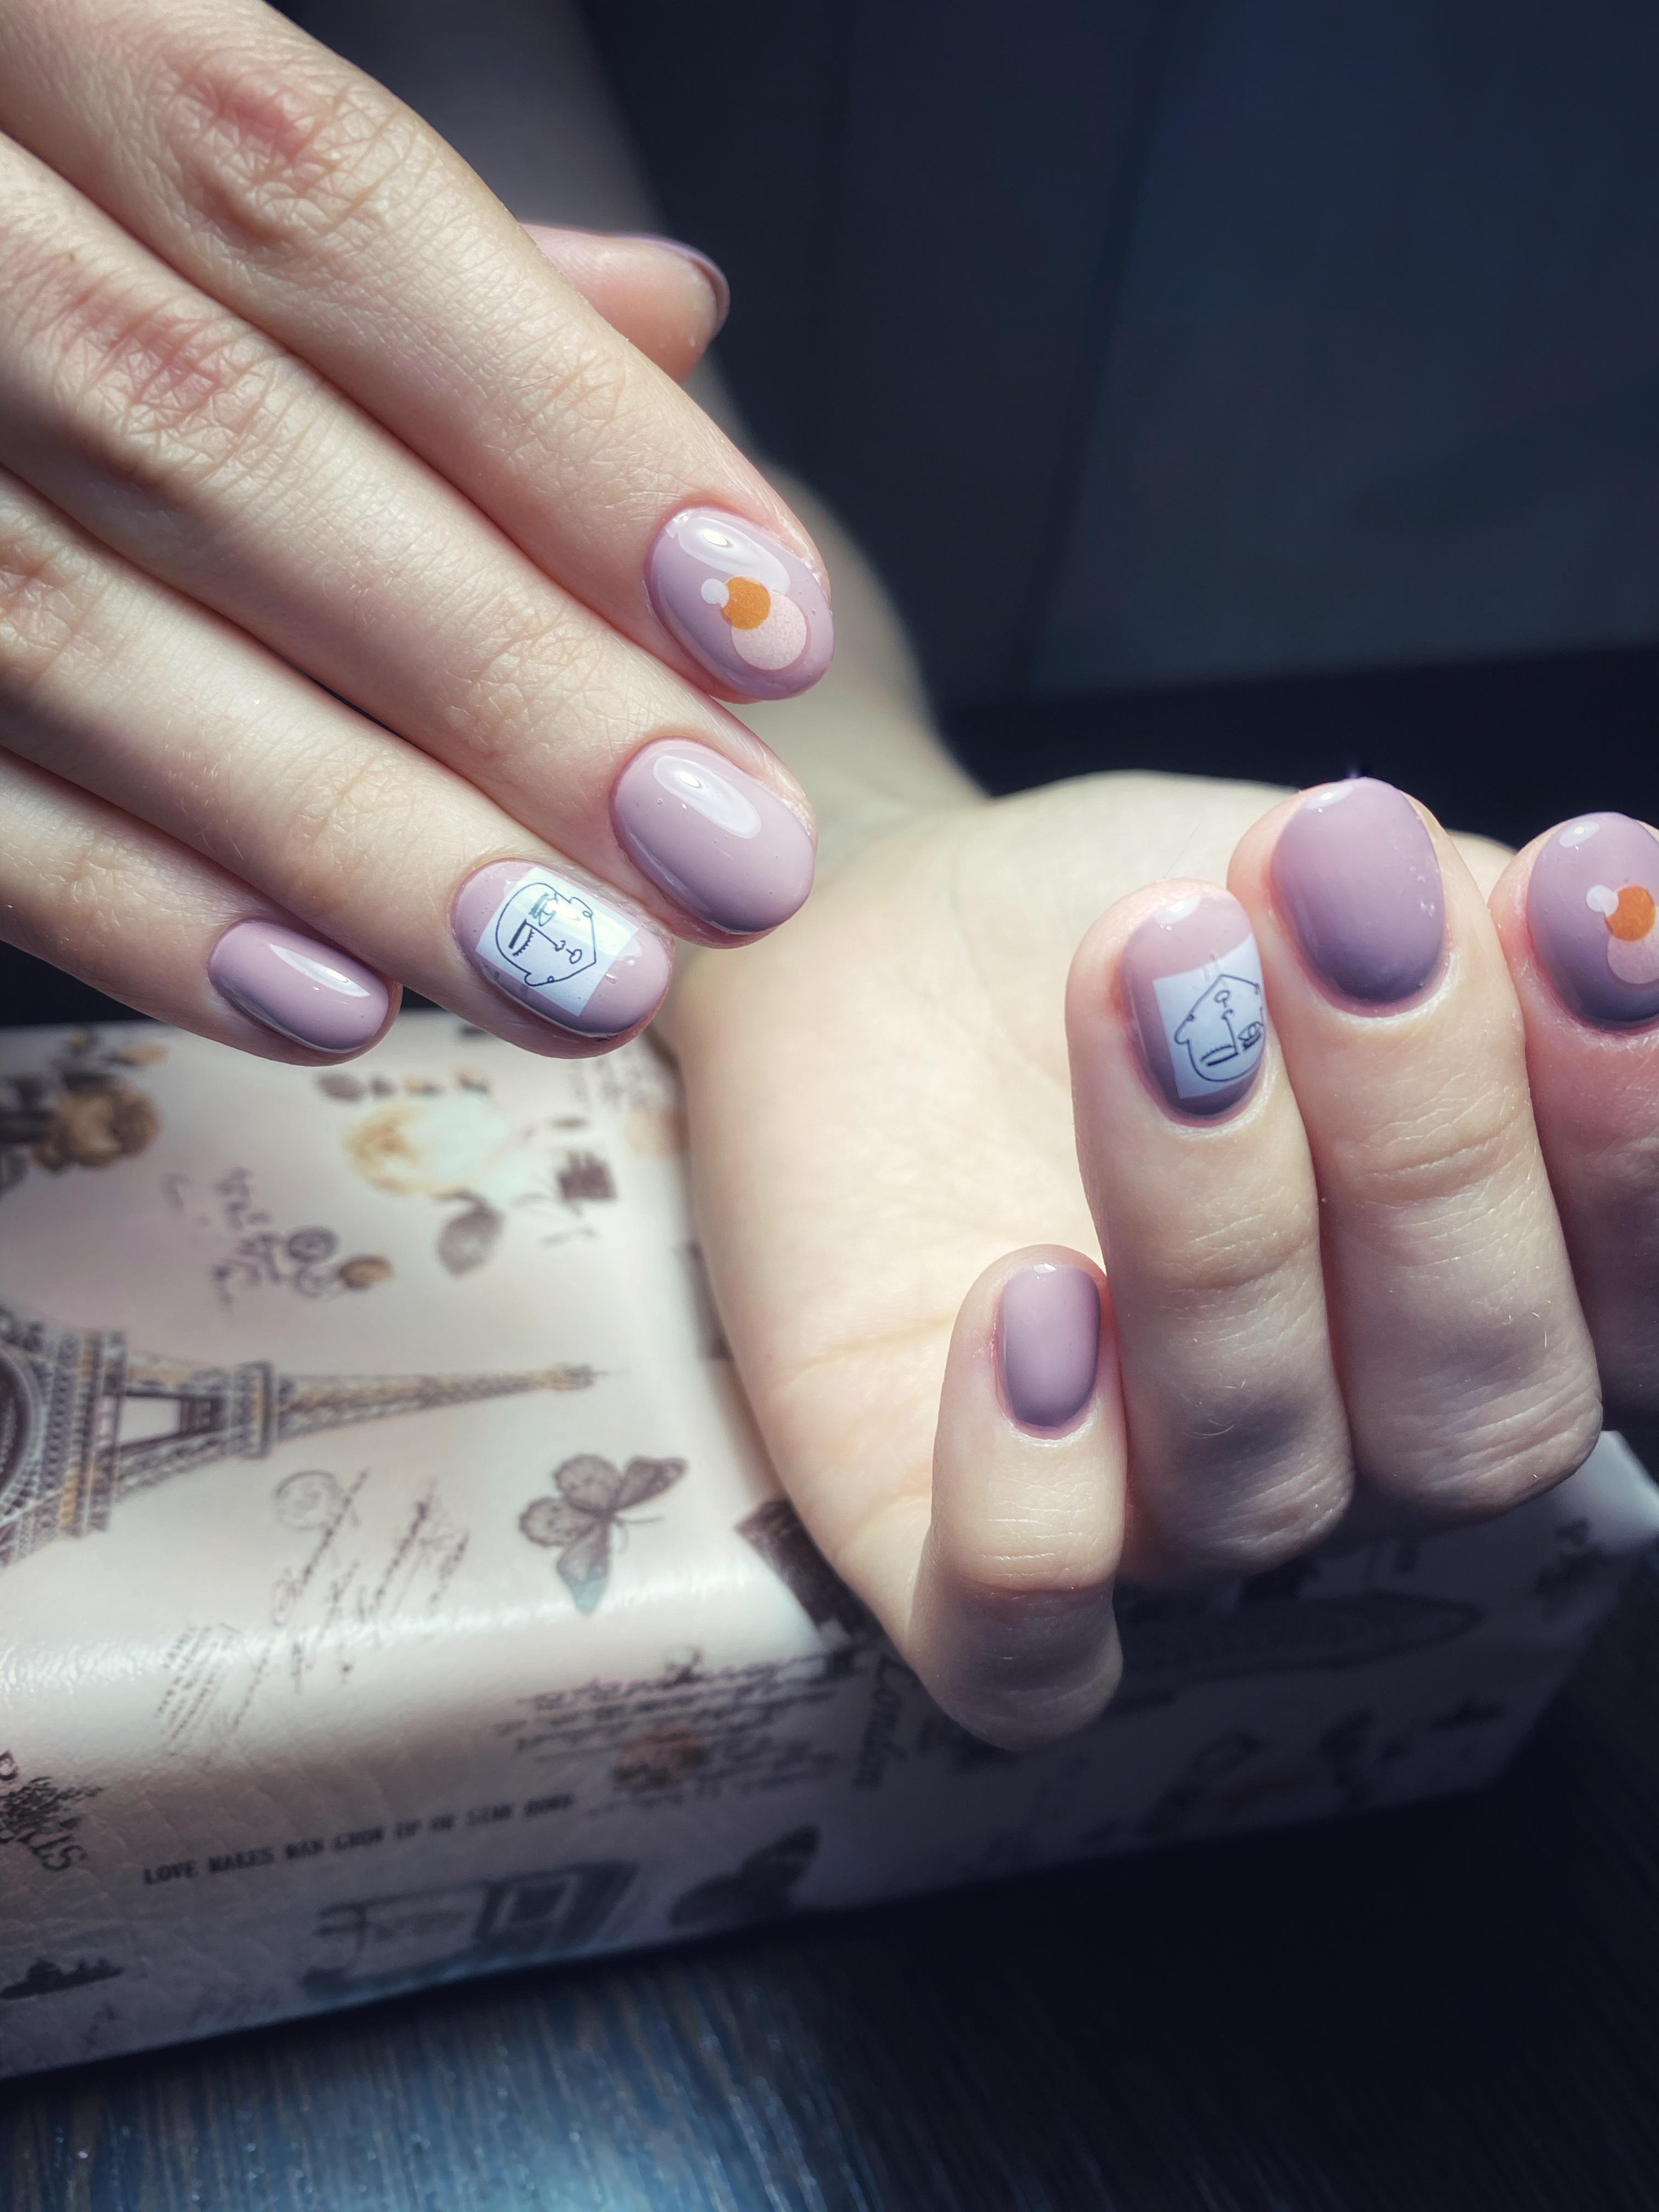 Маникюр со слайдерами в сиреневом цвете на короткие ногти.